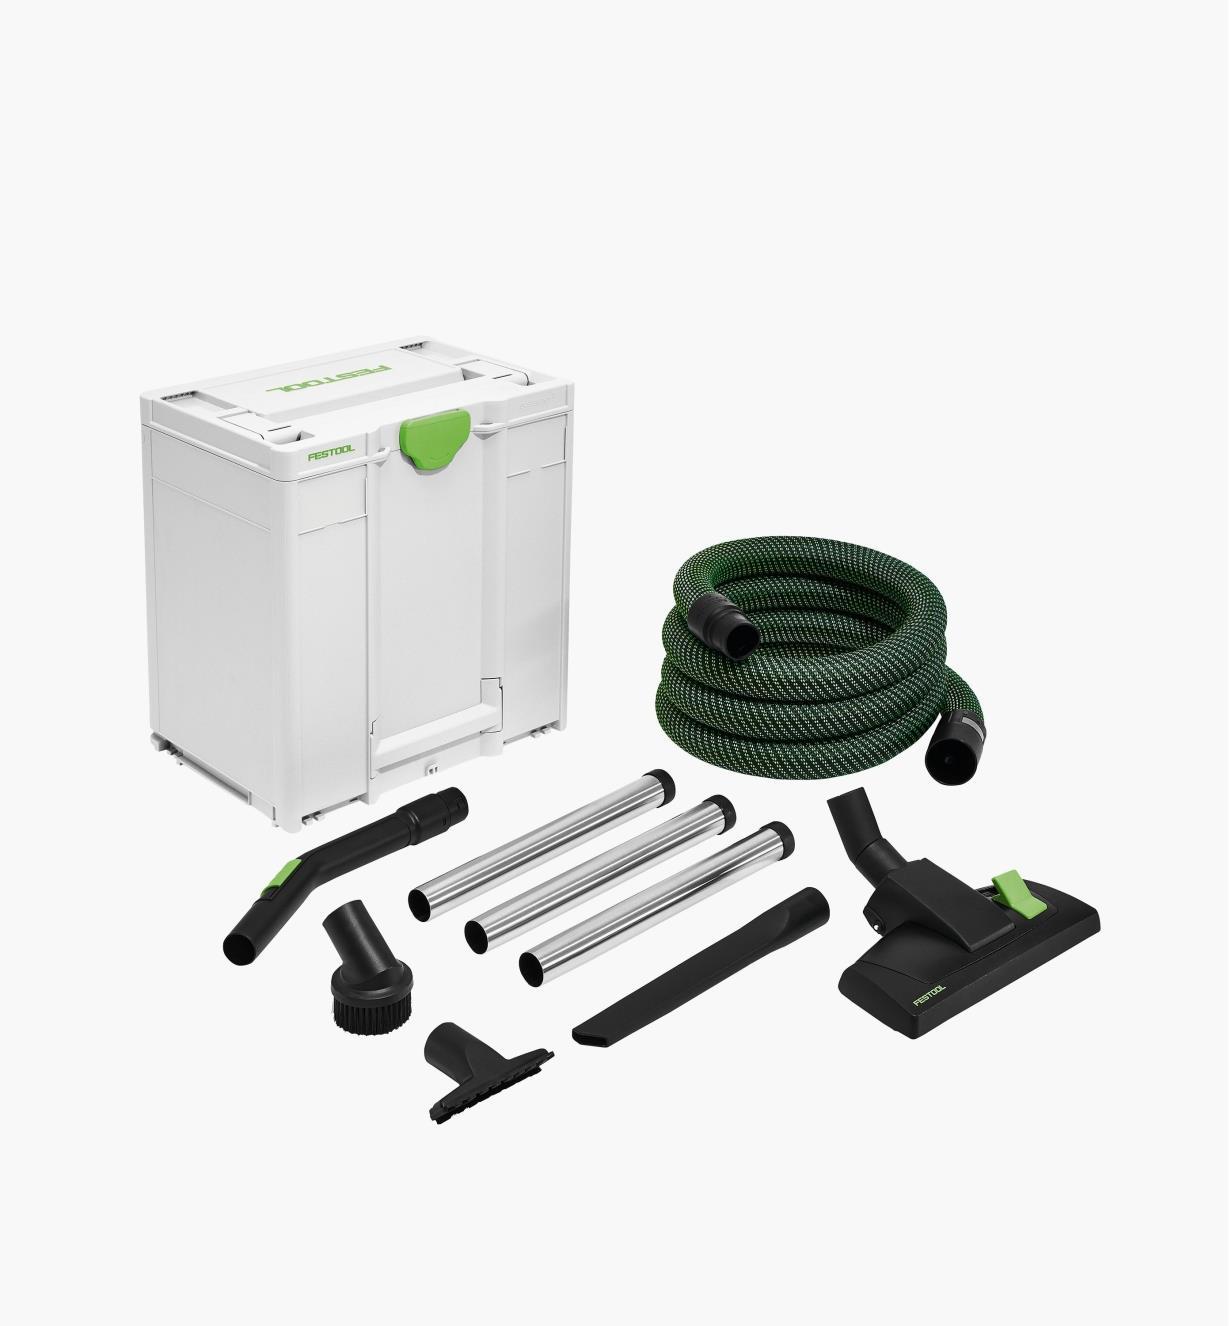 Tradesperson/Installer Dust Extractor Cleaning Set